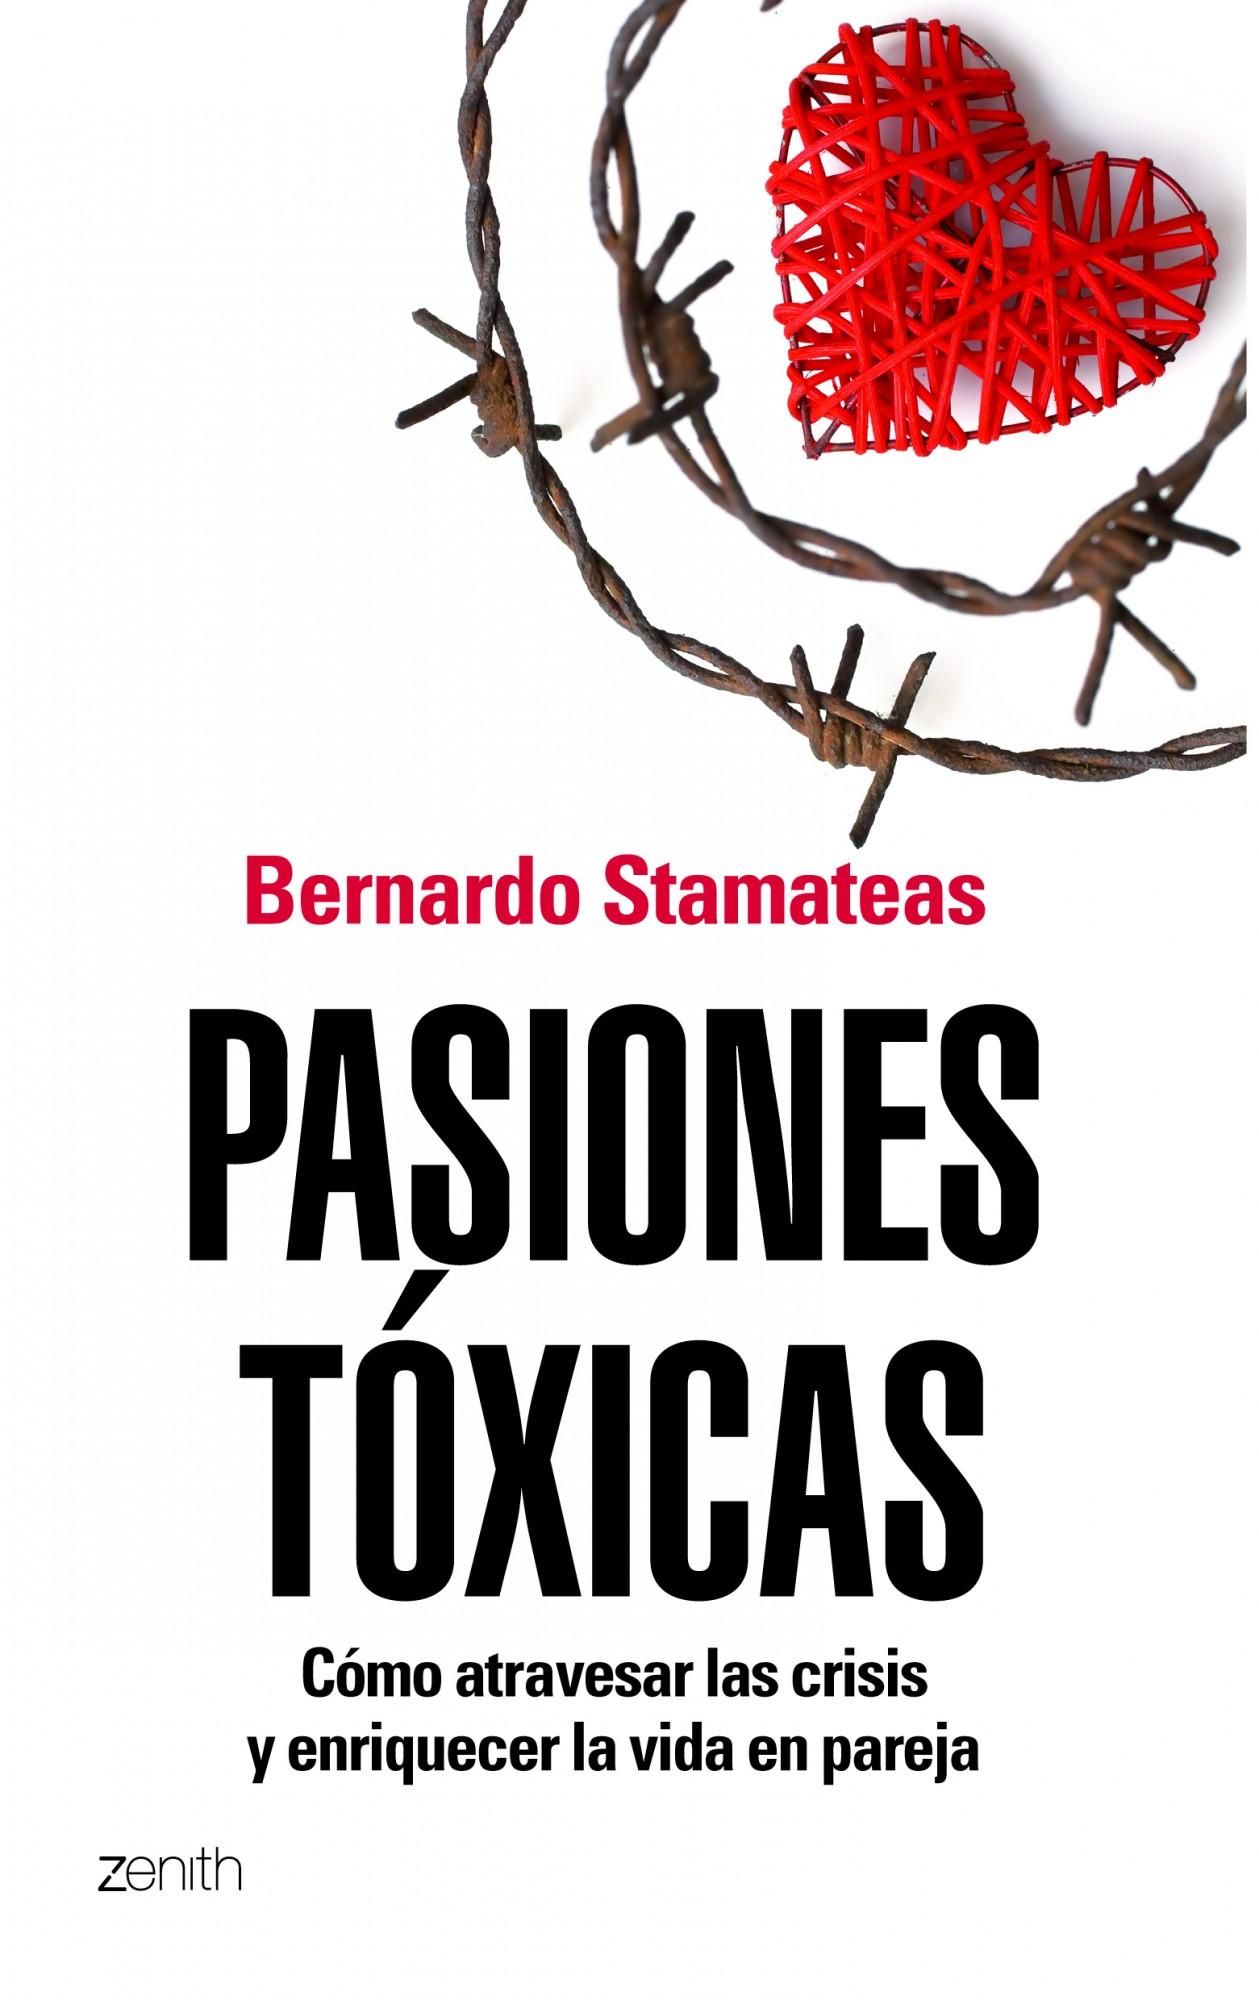 libro-pasiones-toxicas-bernardo-stamateas